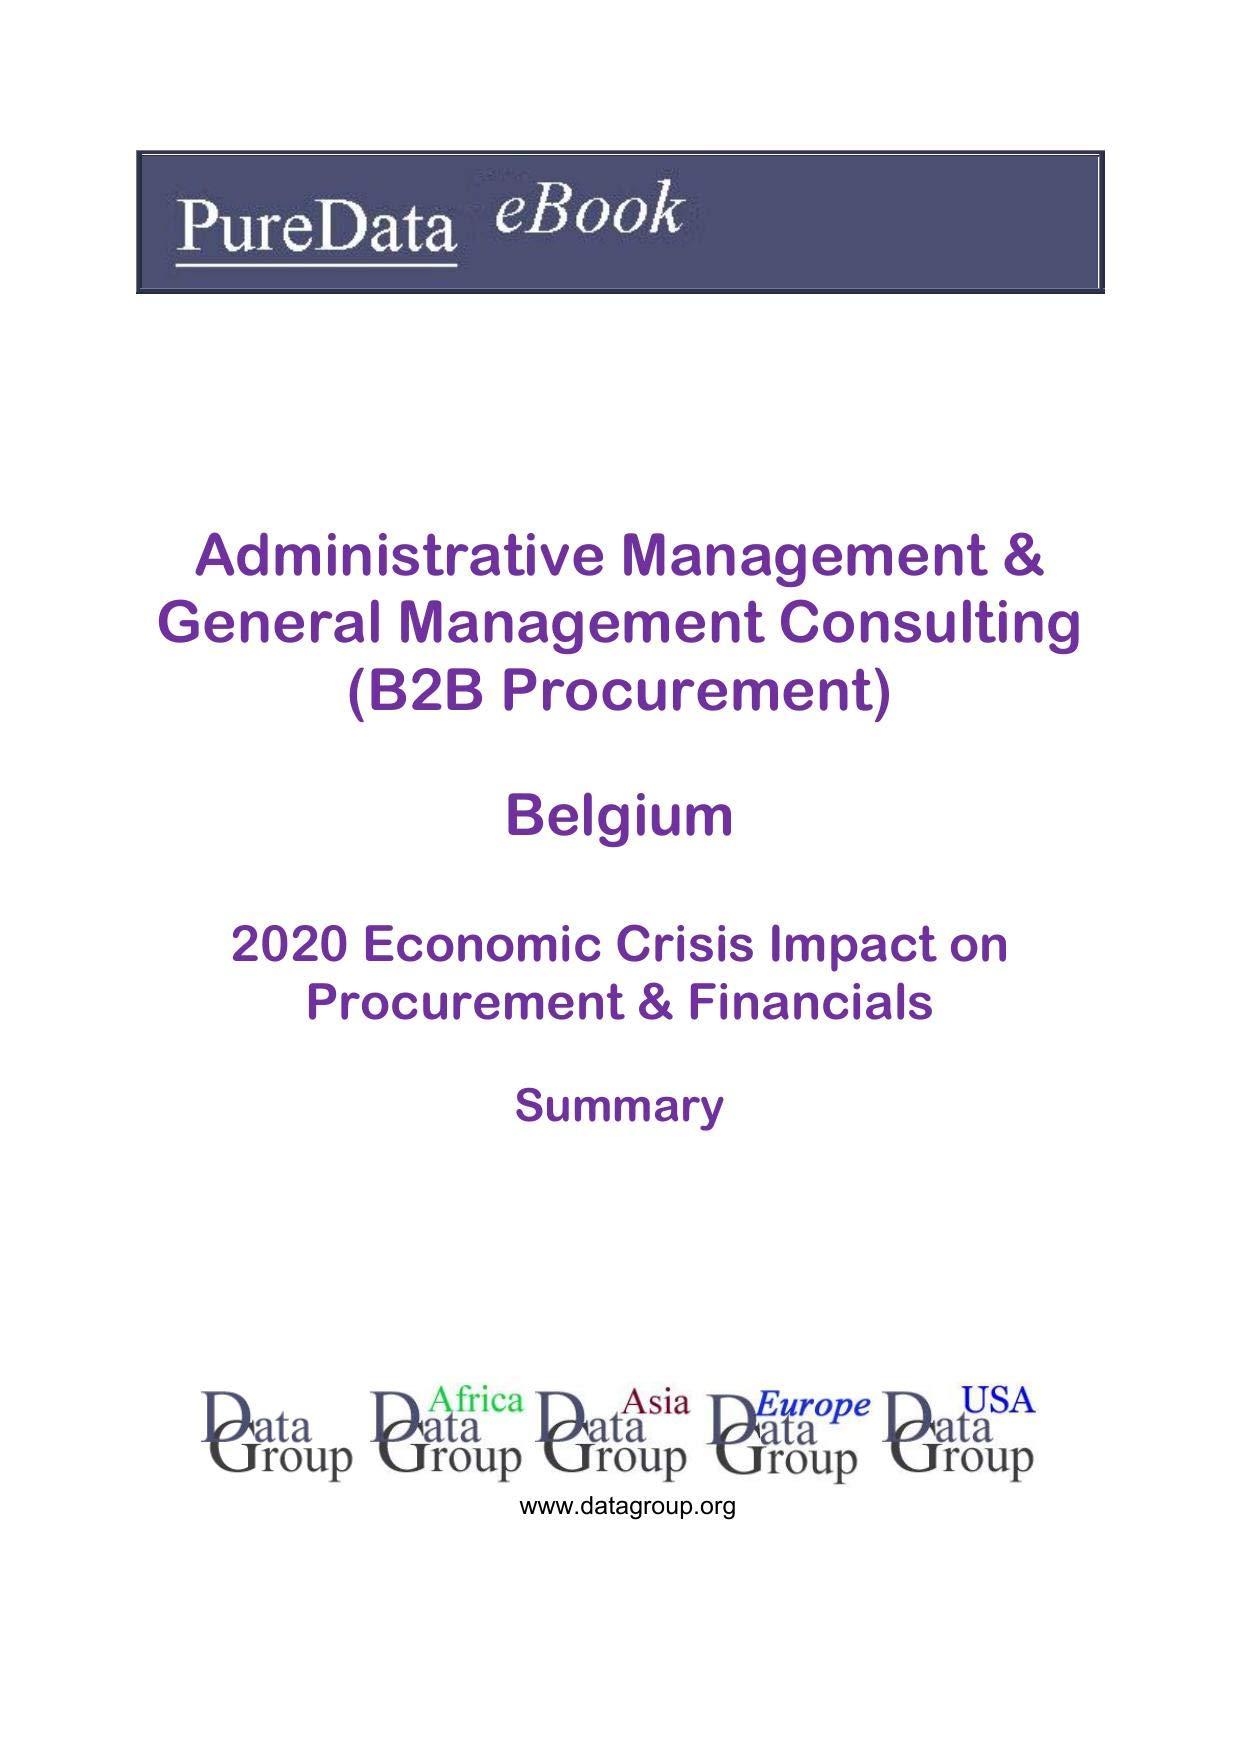 Administrative Management & General Management Consulting (B2B Procurement) Belgium Summary: 2020 Economic Crisis Impact on Revenues & Financials